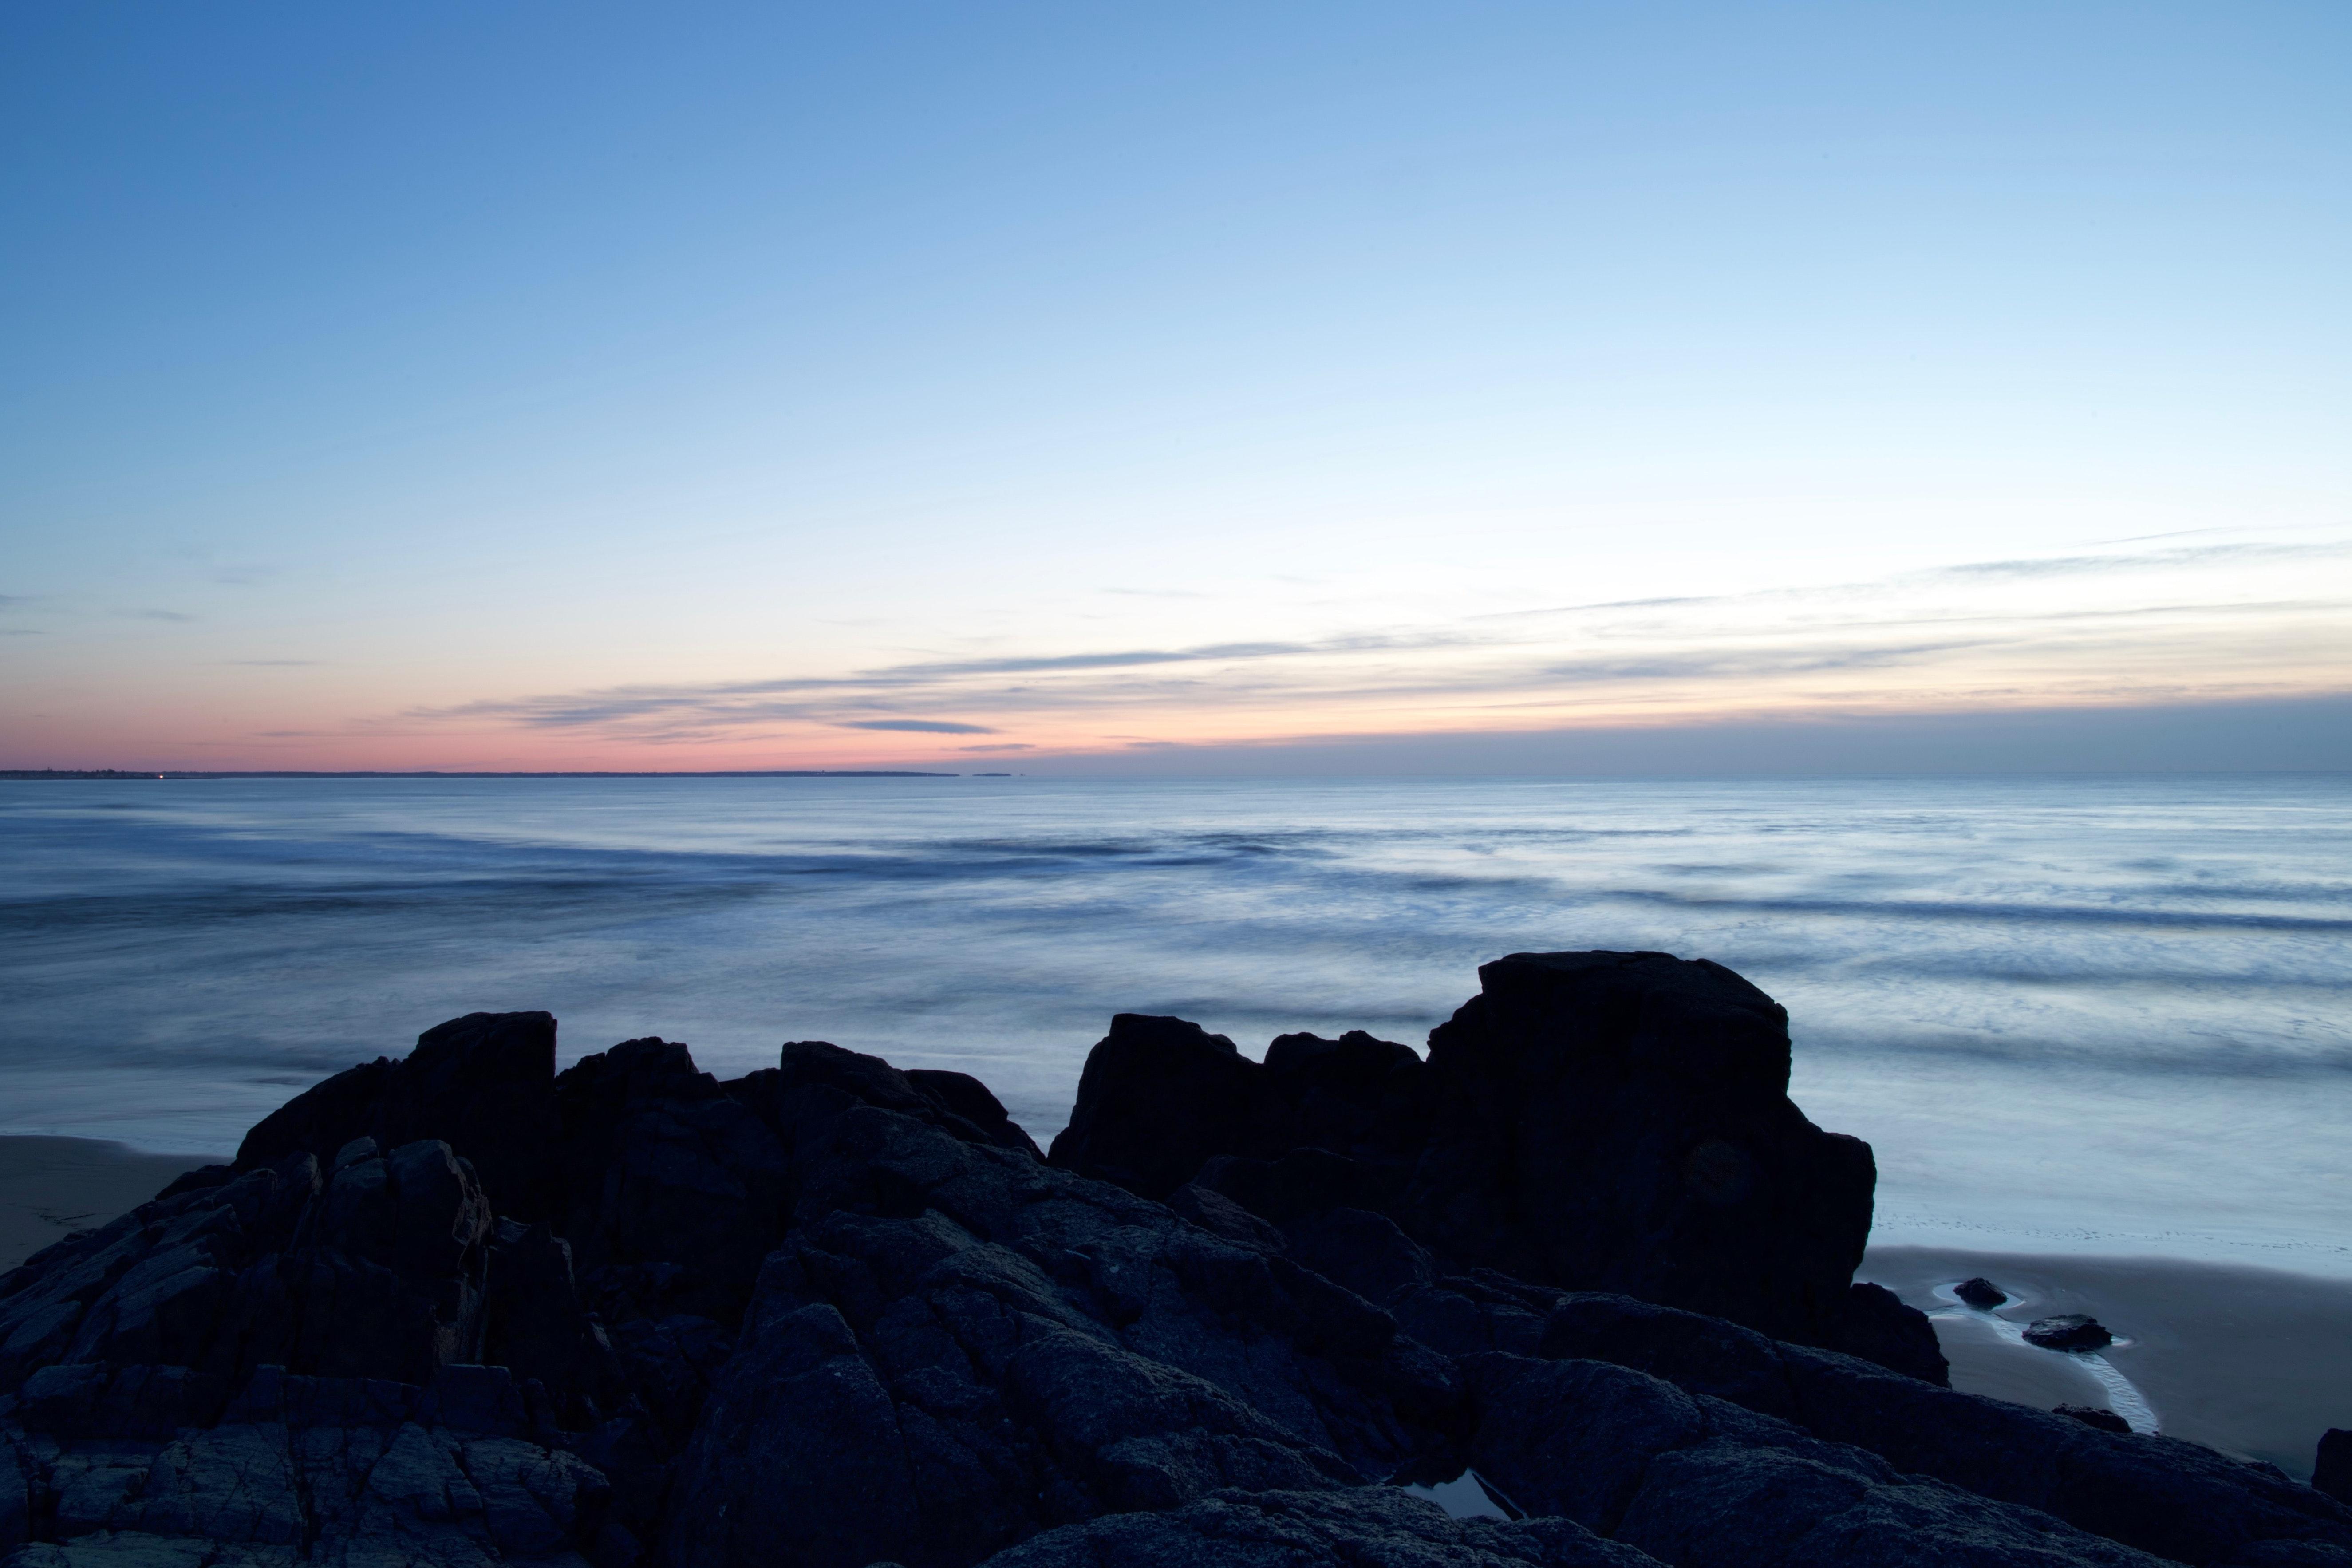 Rocks on Seashore, Beach, Sea, Water, Sky, HQ Photo